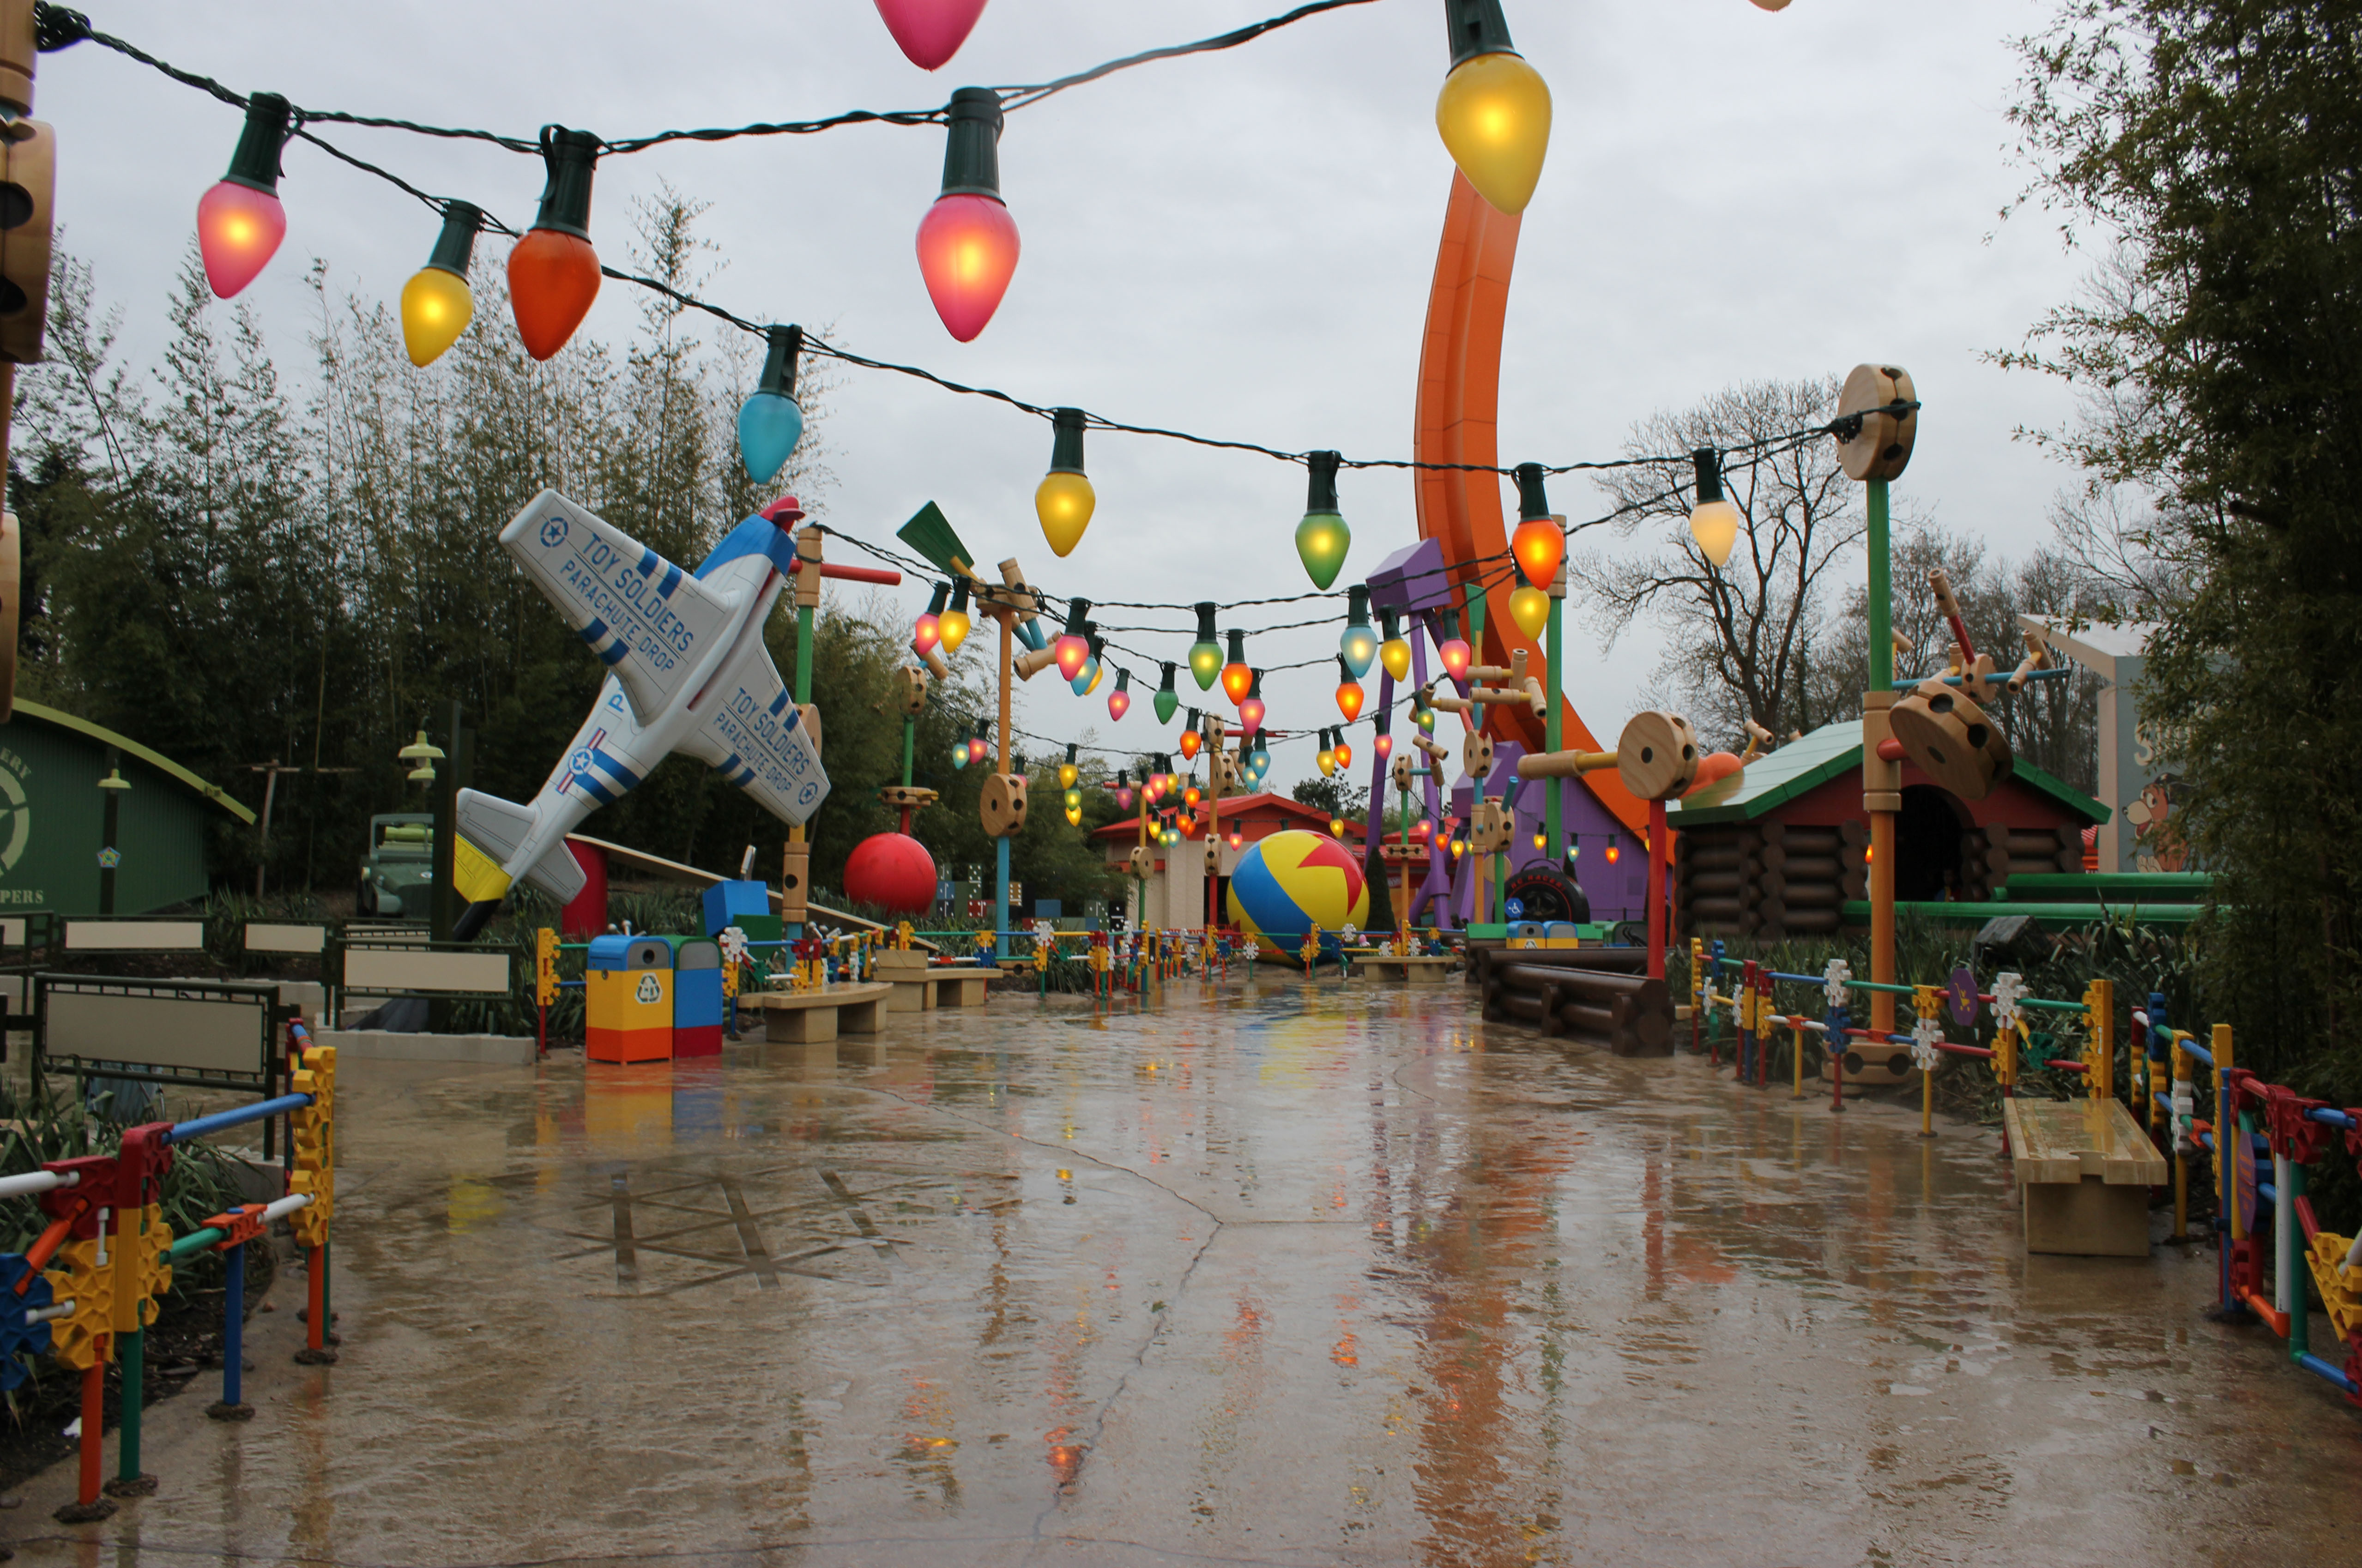 Toy Story Playland in the Walt Disney Studios Park at Disneyland Paris